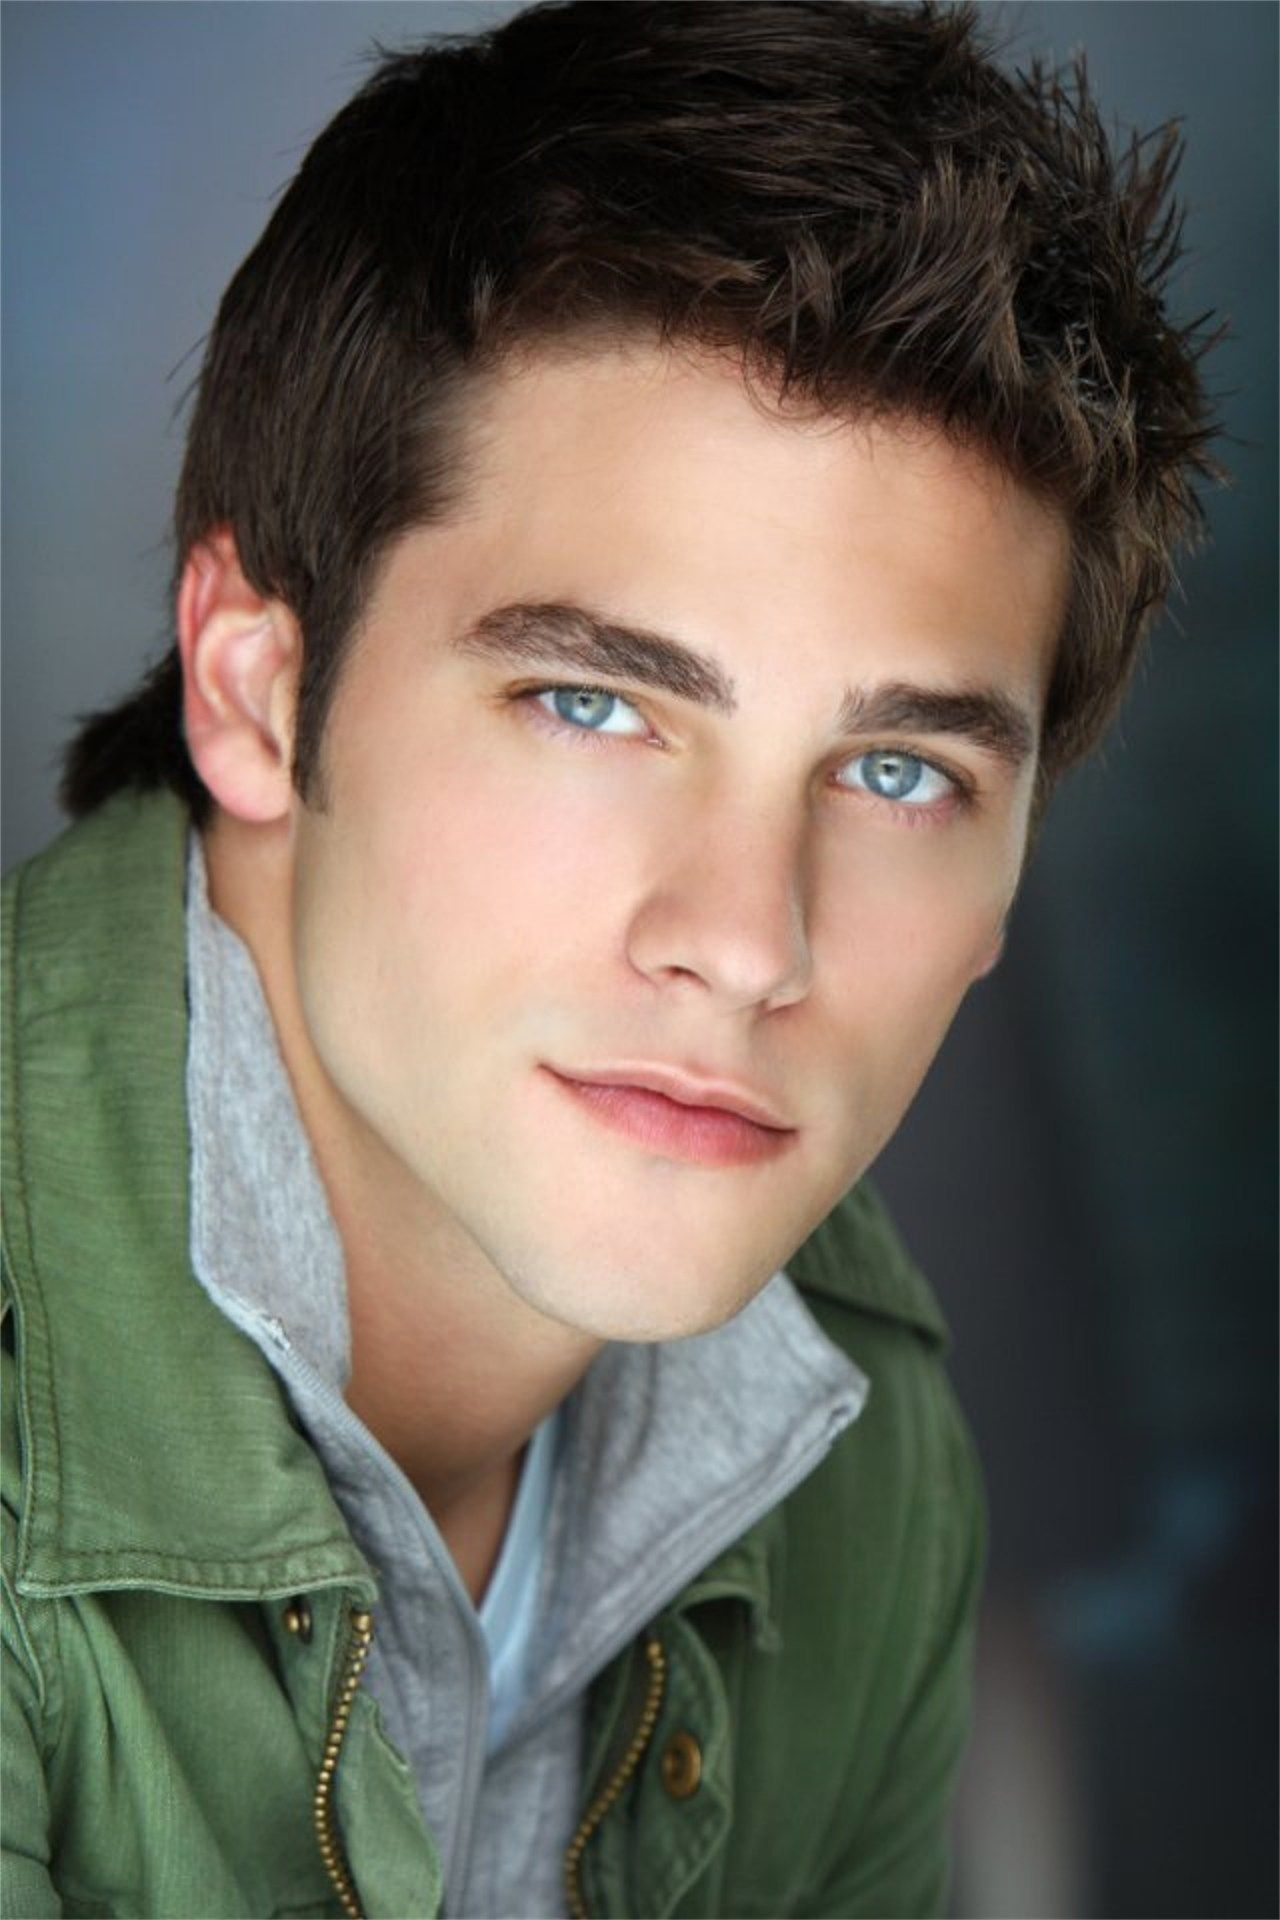 Pin By Bojogayo On Deaken Bluman In 2020 Brown Hair Blue Eyes Celebrities Male Tv Actors